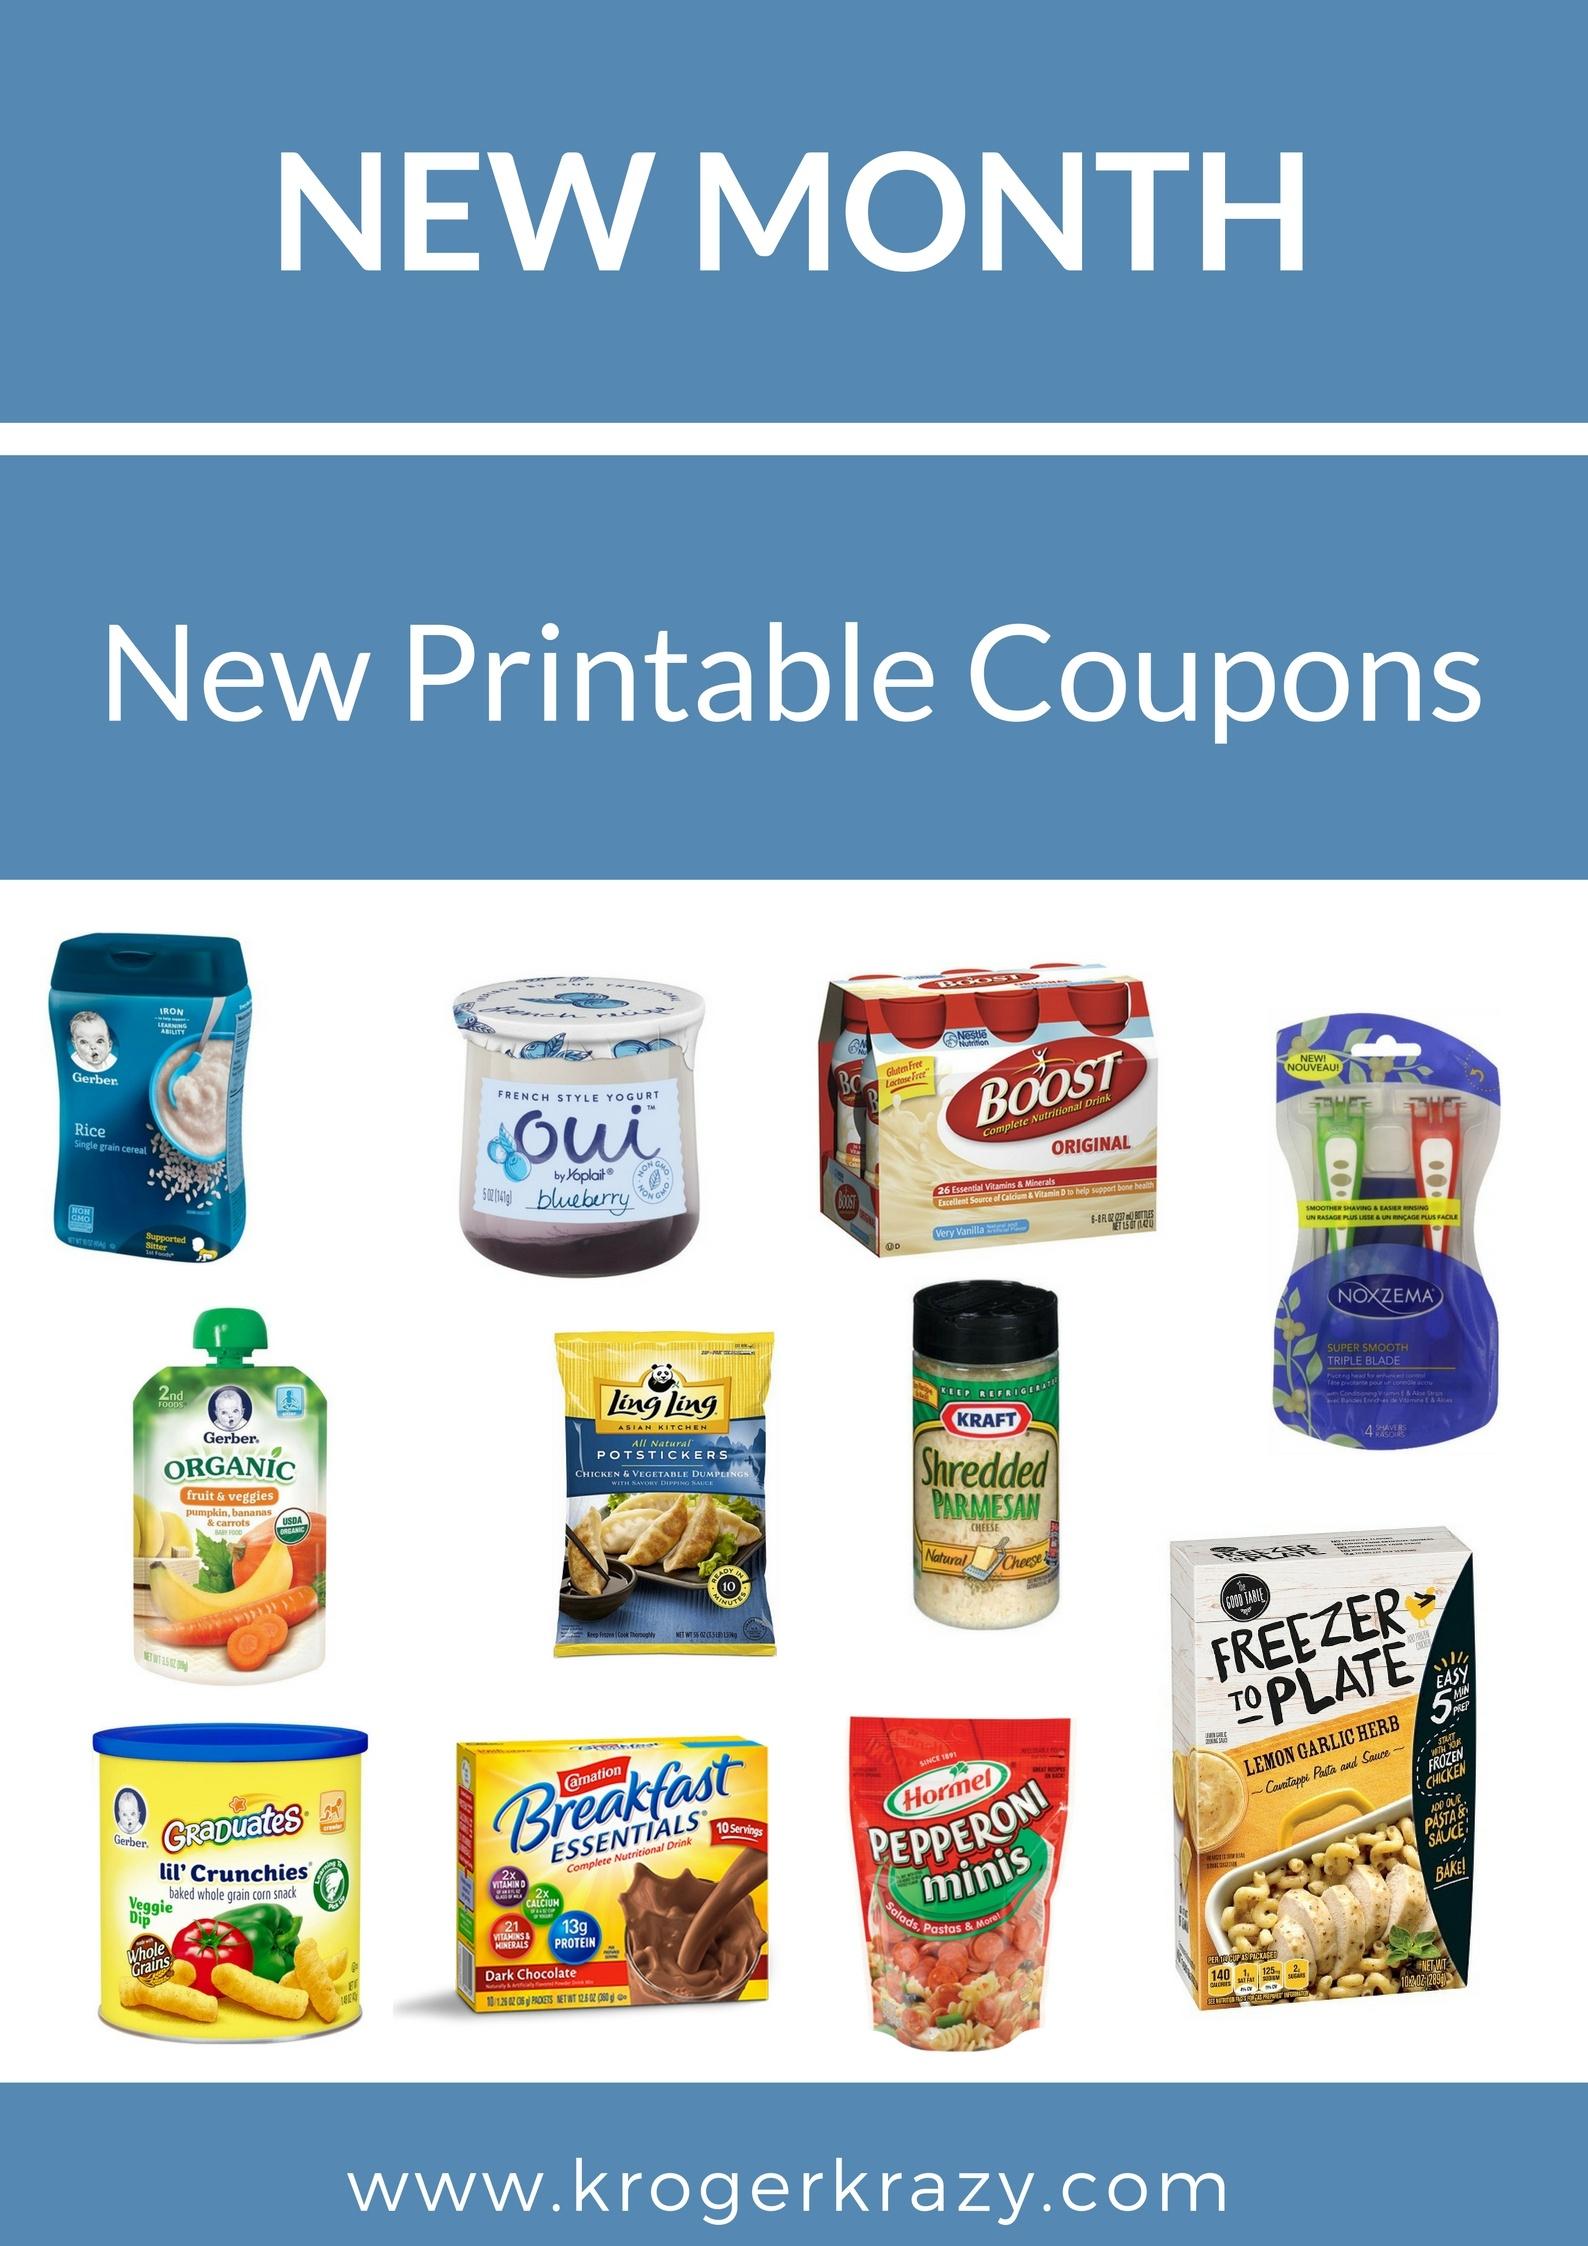 New Month! New Printable Coupons! Kraft, Post, Gerber, Noxzema - Free Printable Kraft Food Coupons